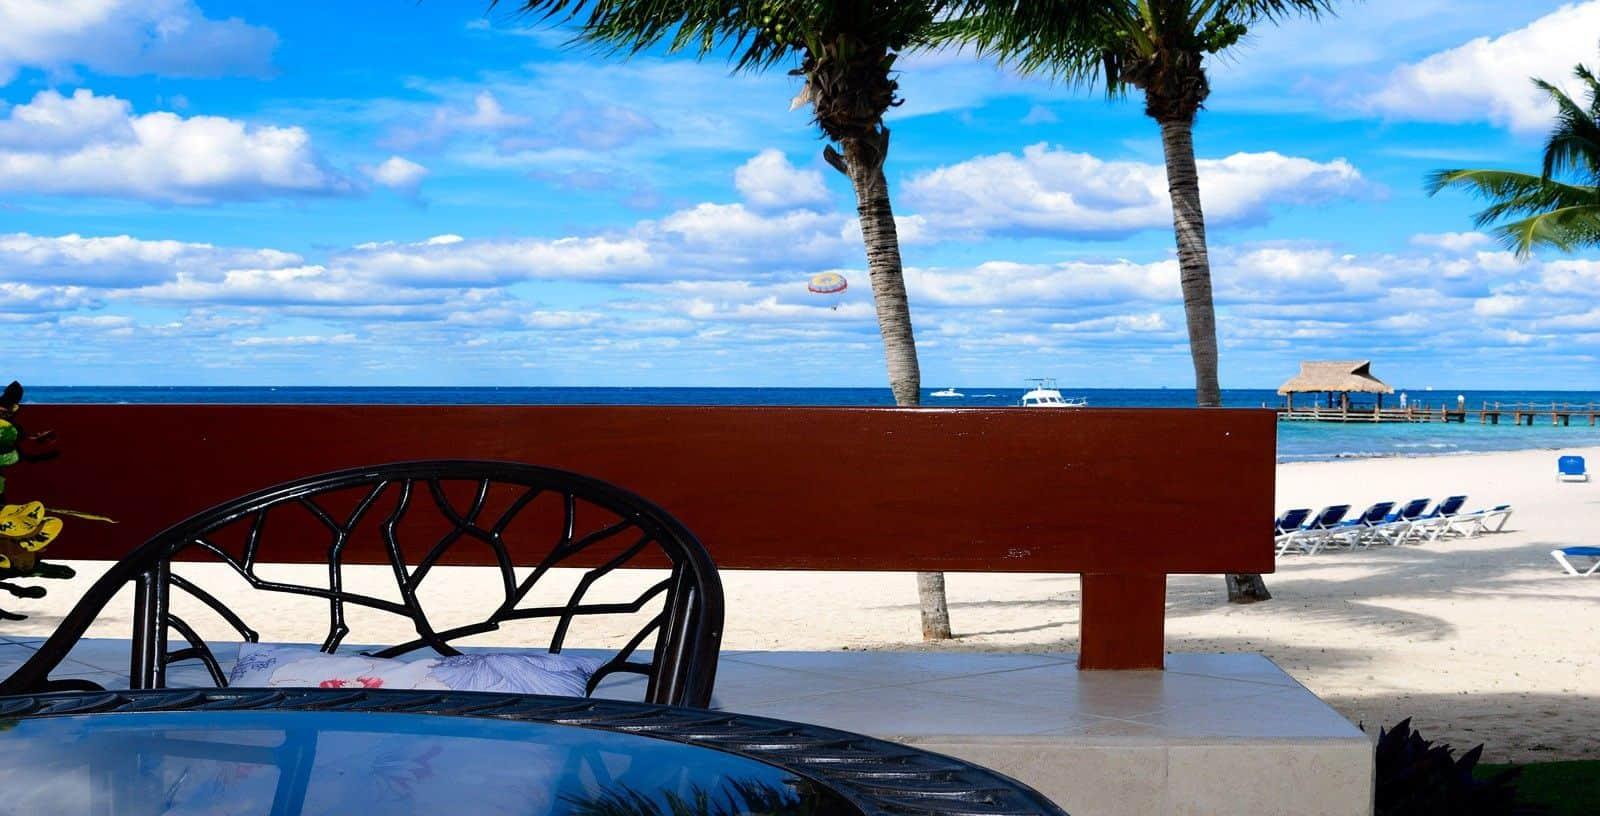 residencias reef 5110